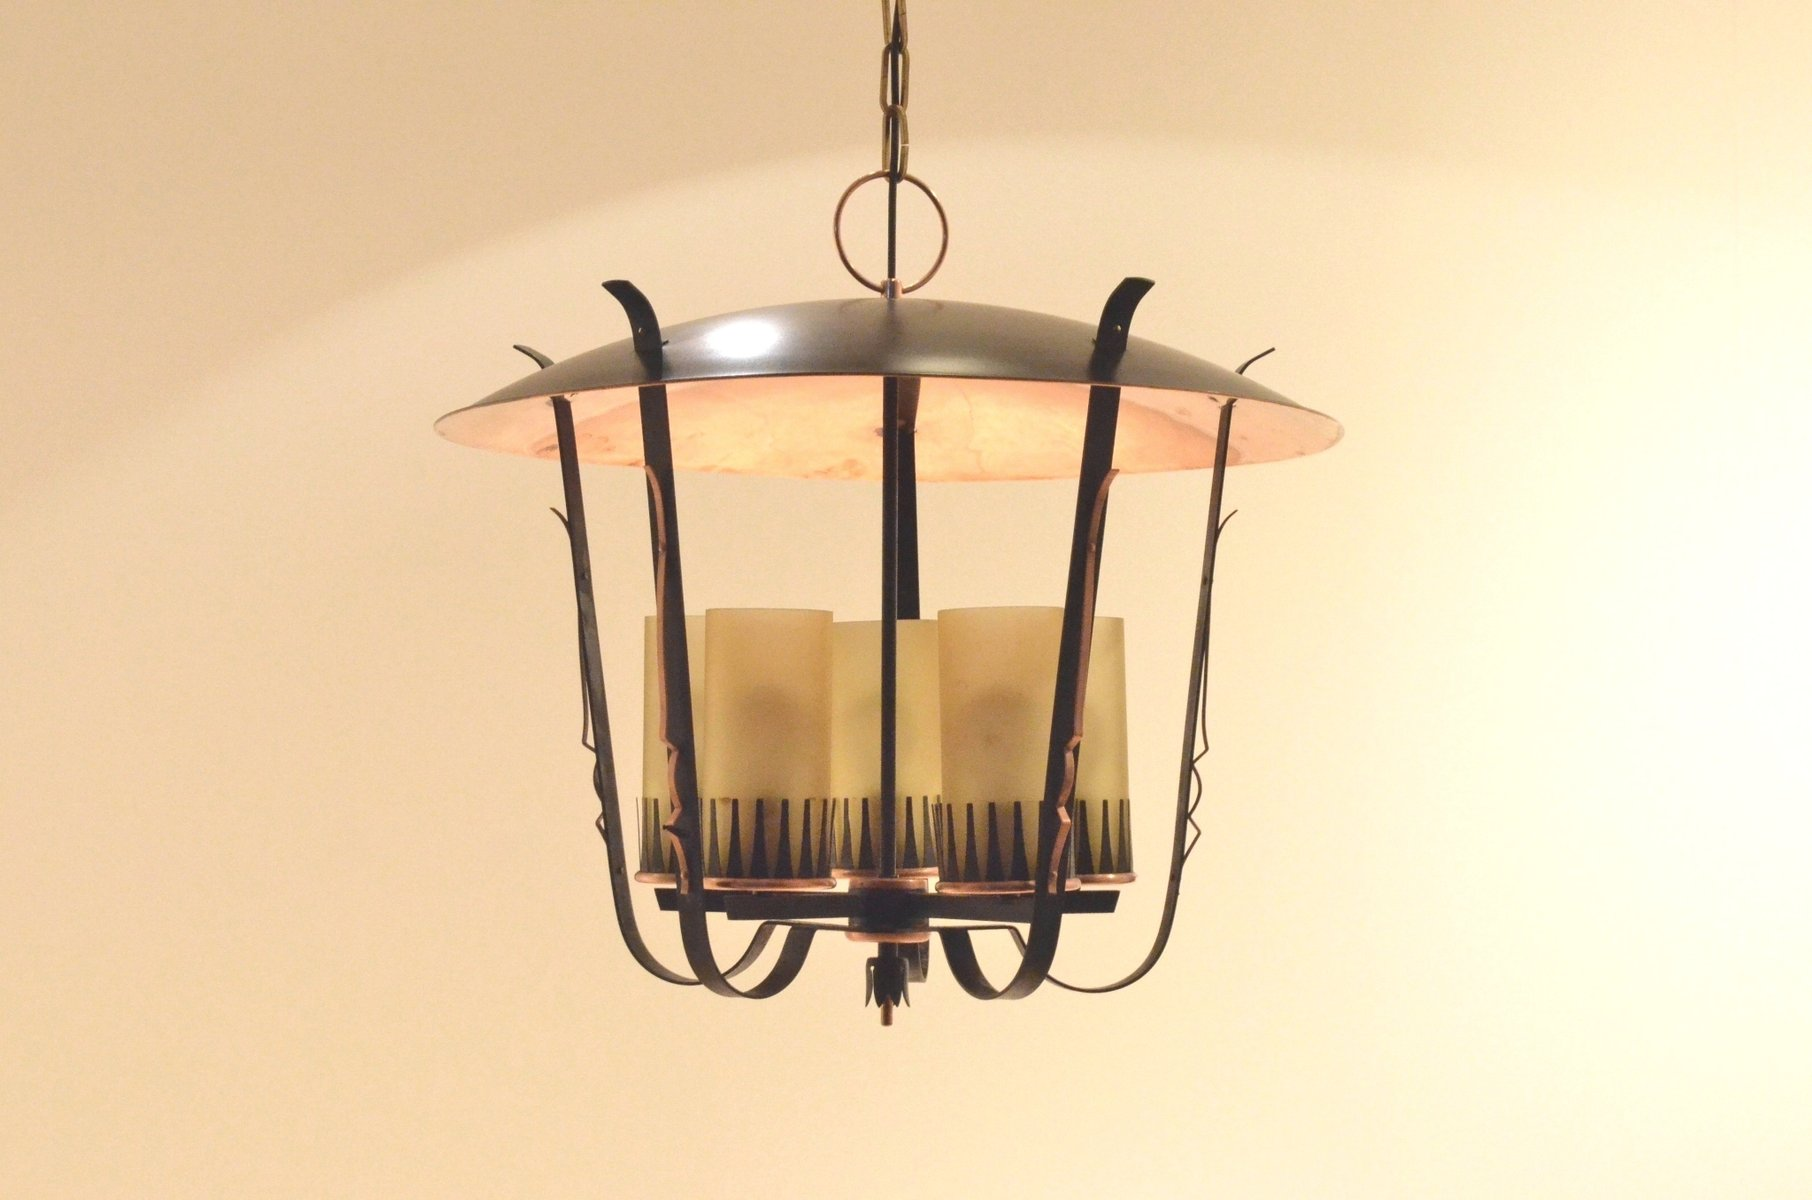 Art Deco Lantern Chandelier, 1940s for sale at Pamono